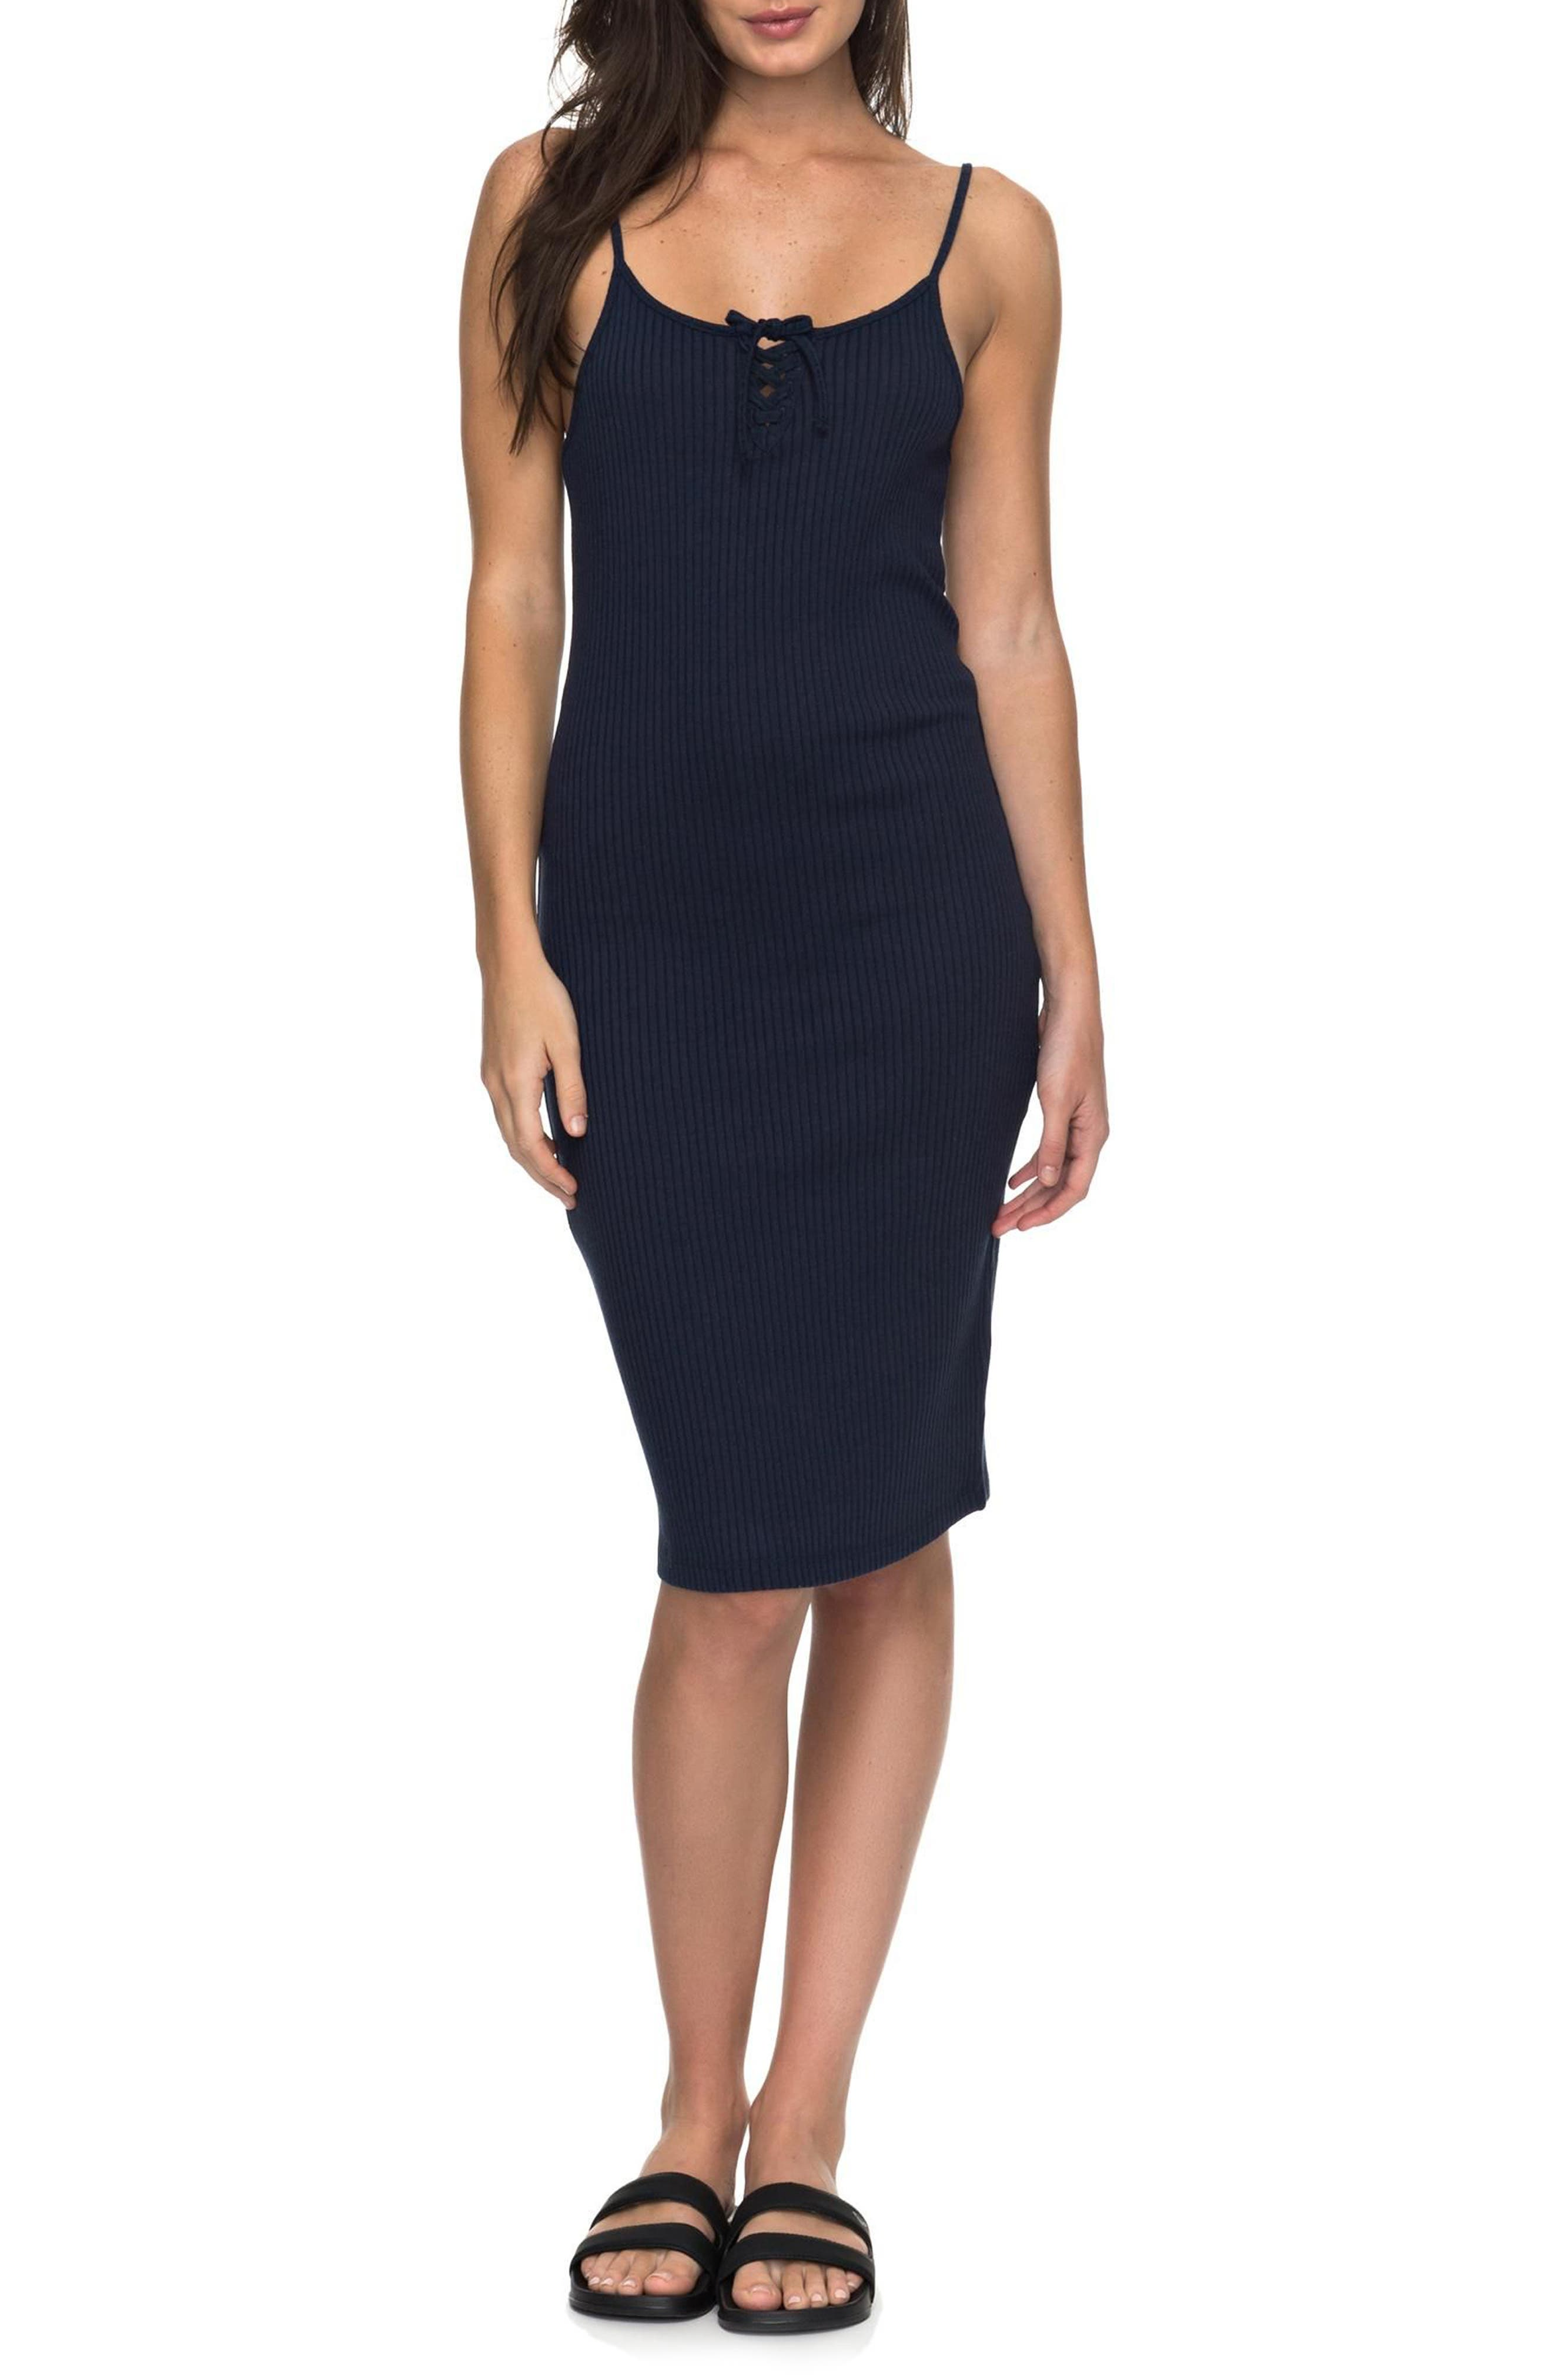 Alternate Image 1 Selected - Roxy Happy New Way Body-Con Midi Dress